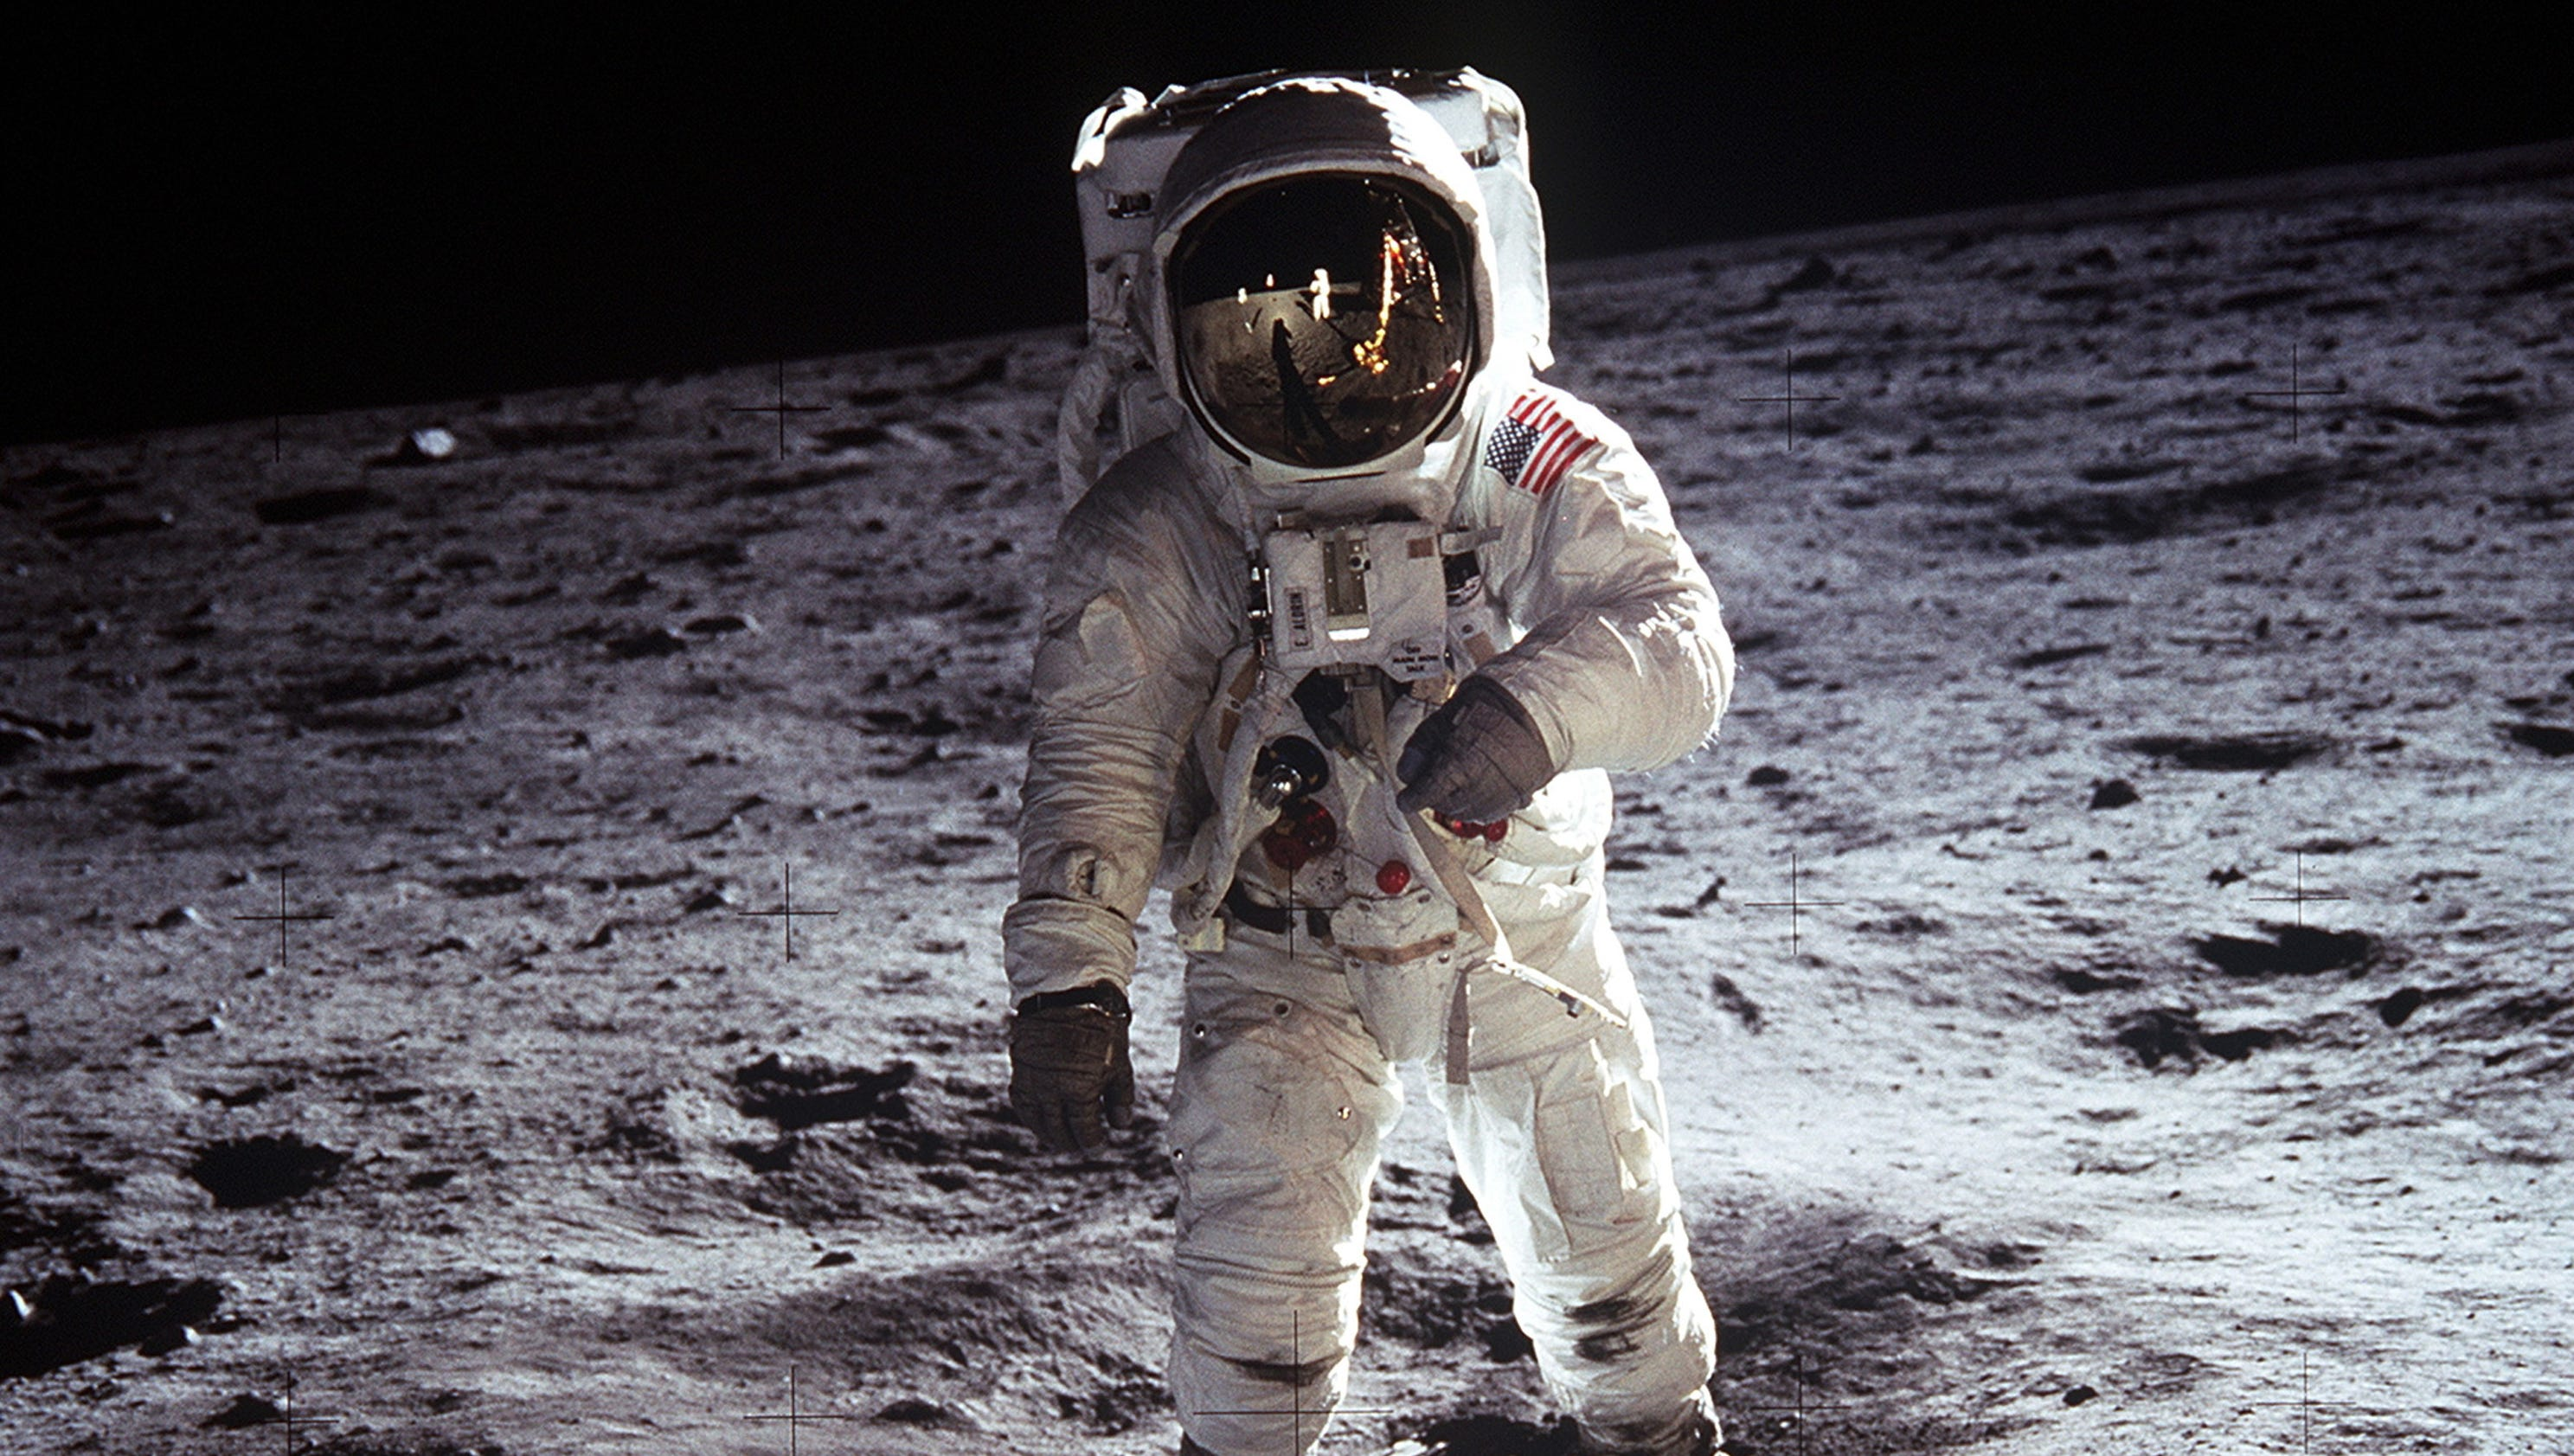 Apollo 13 Quotes Ele legacies of apollo 11, 45 years after the moon landing